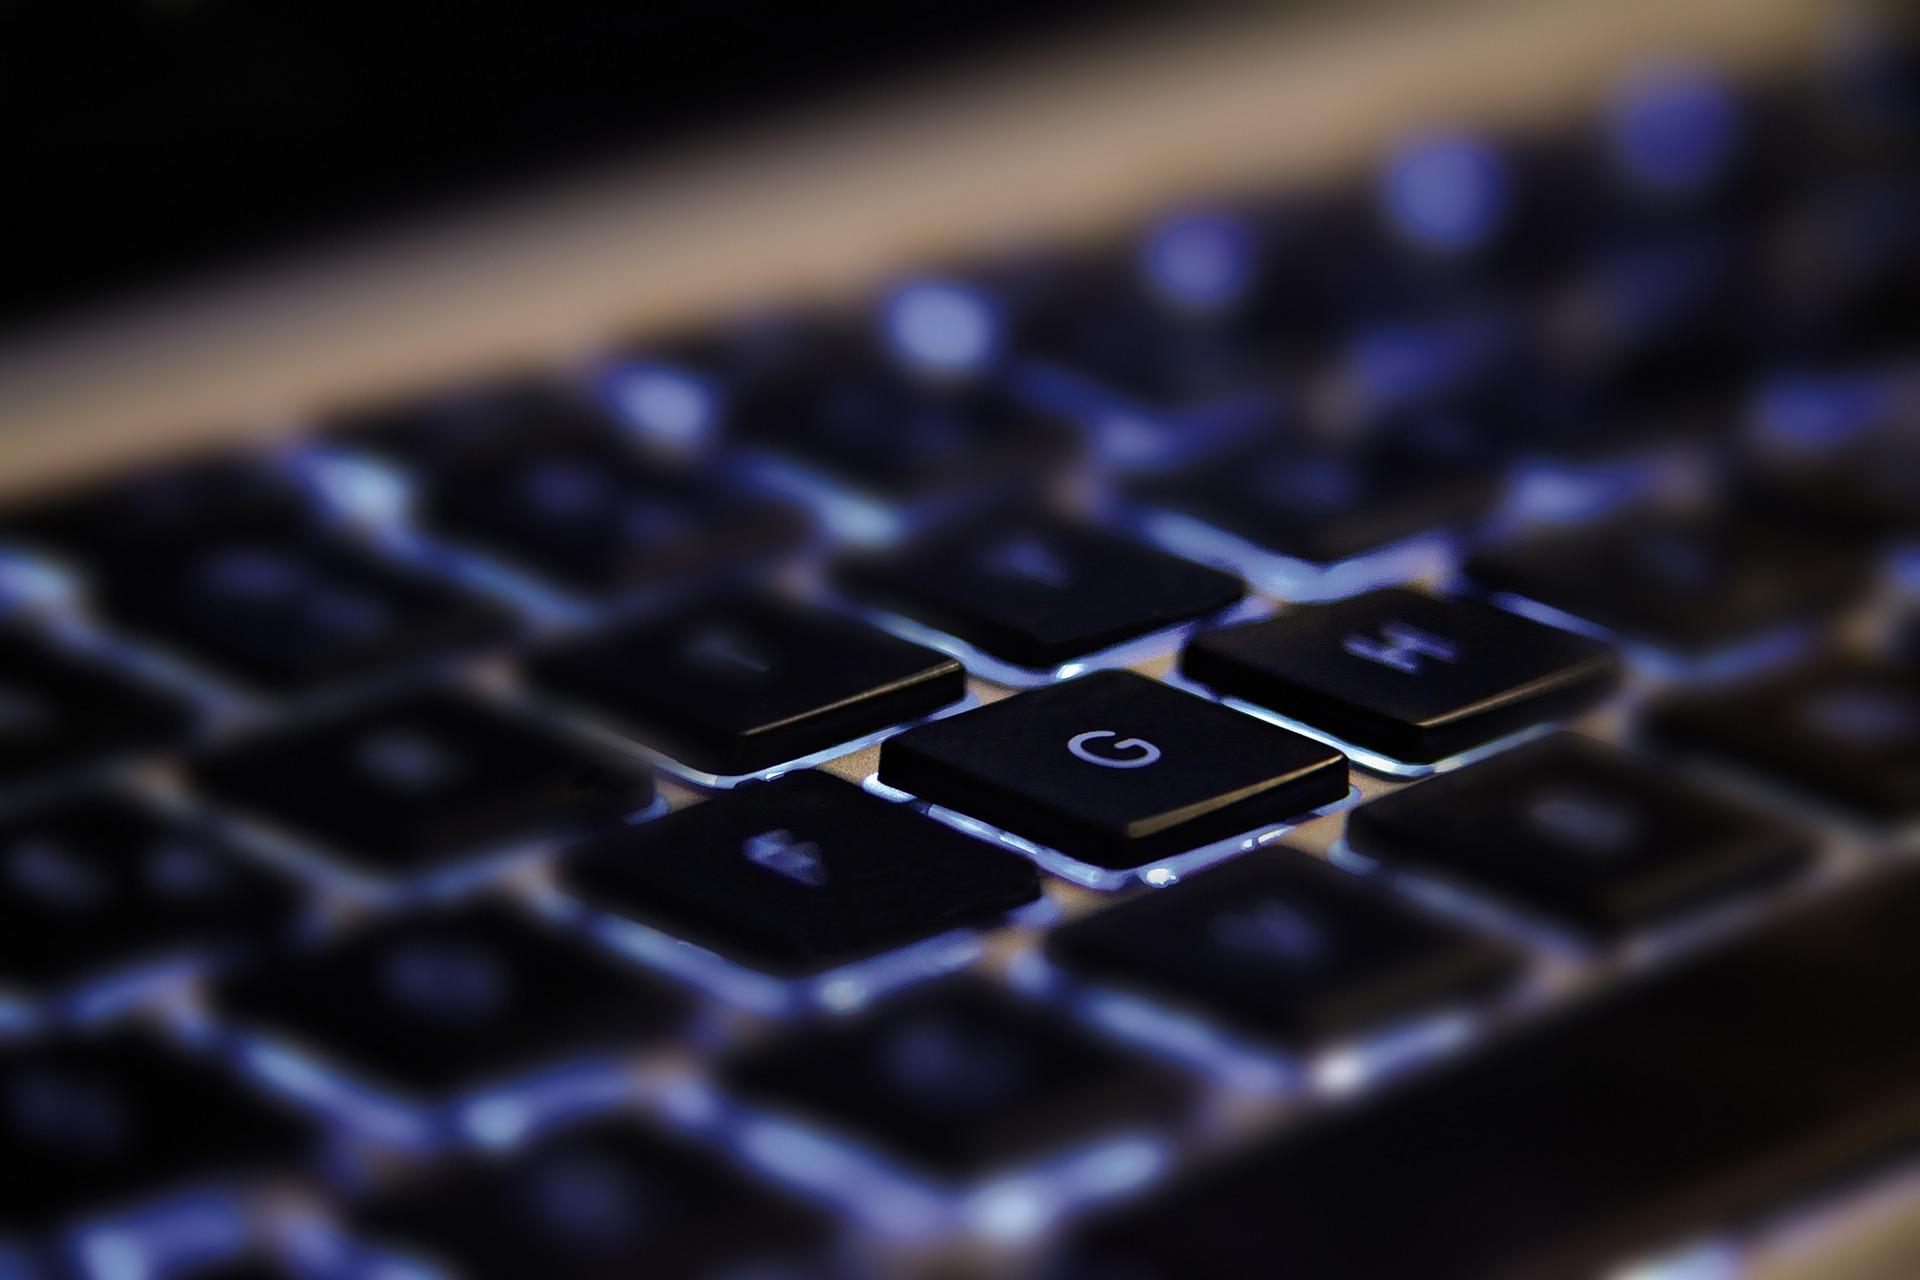 macOS Sierra vergisst SSH-Keys